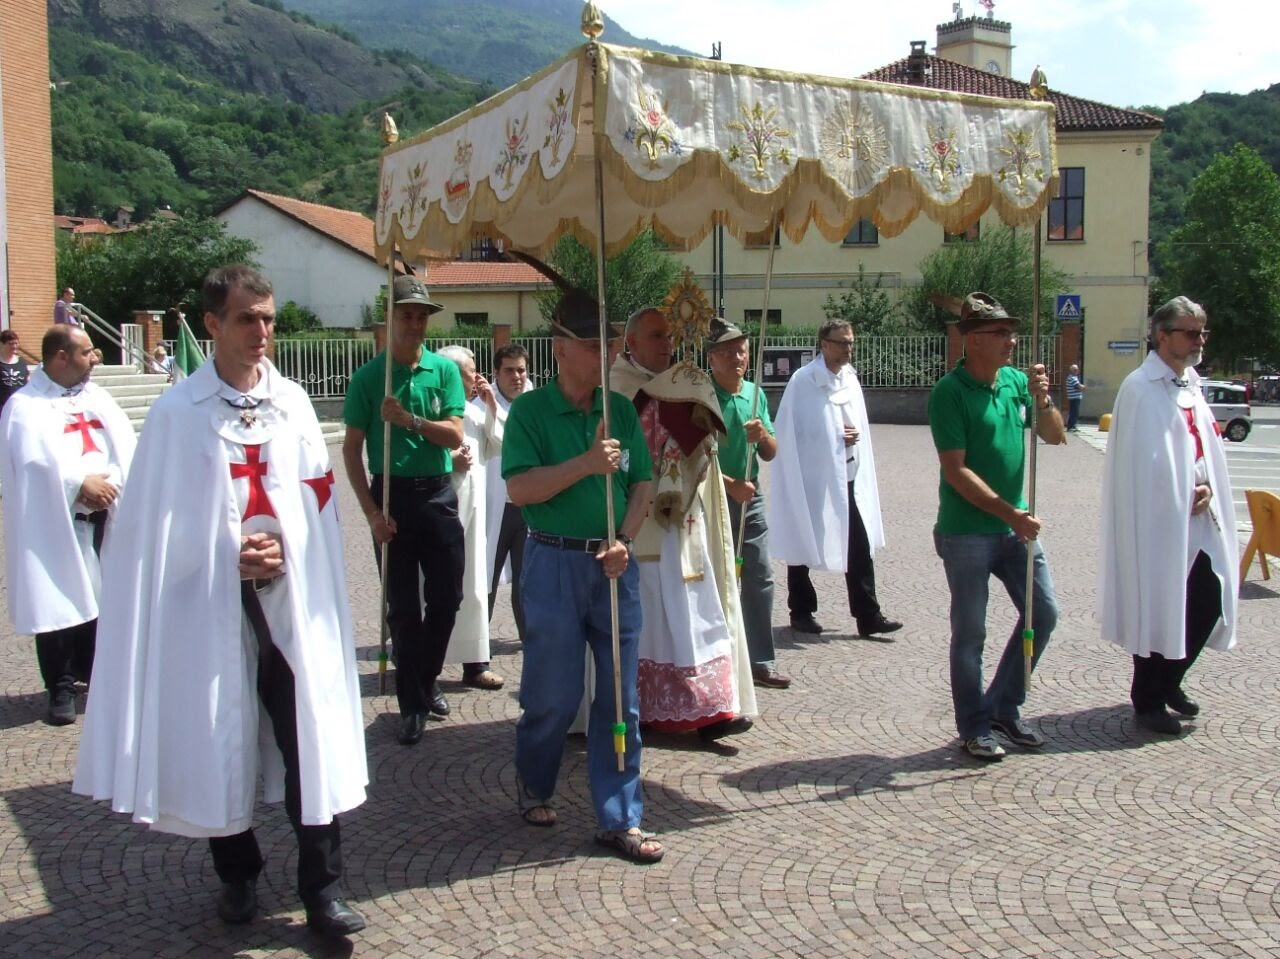 templari corpus domini condove torino